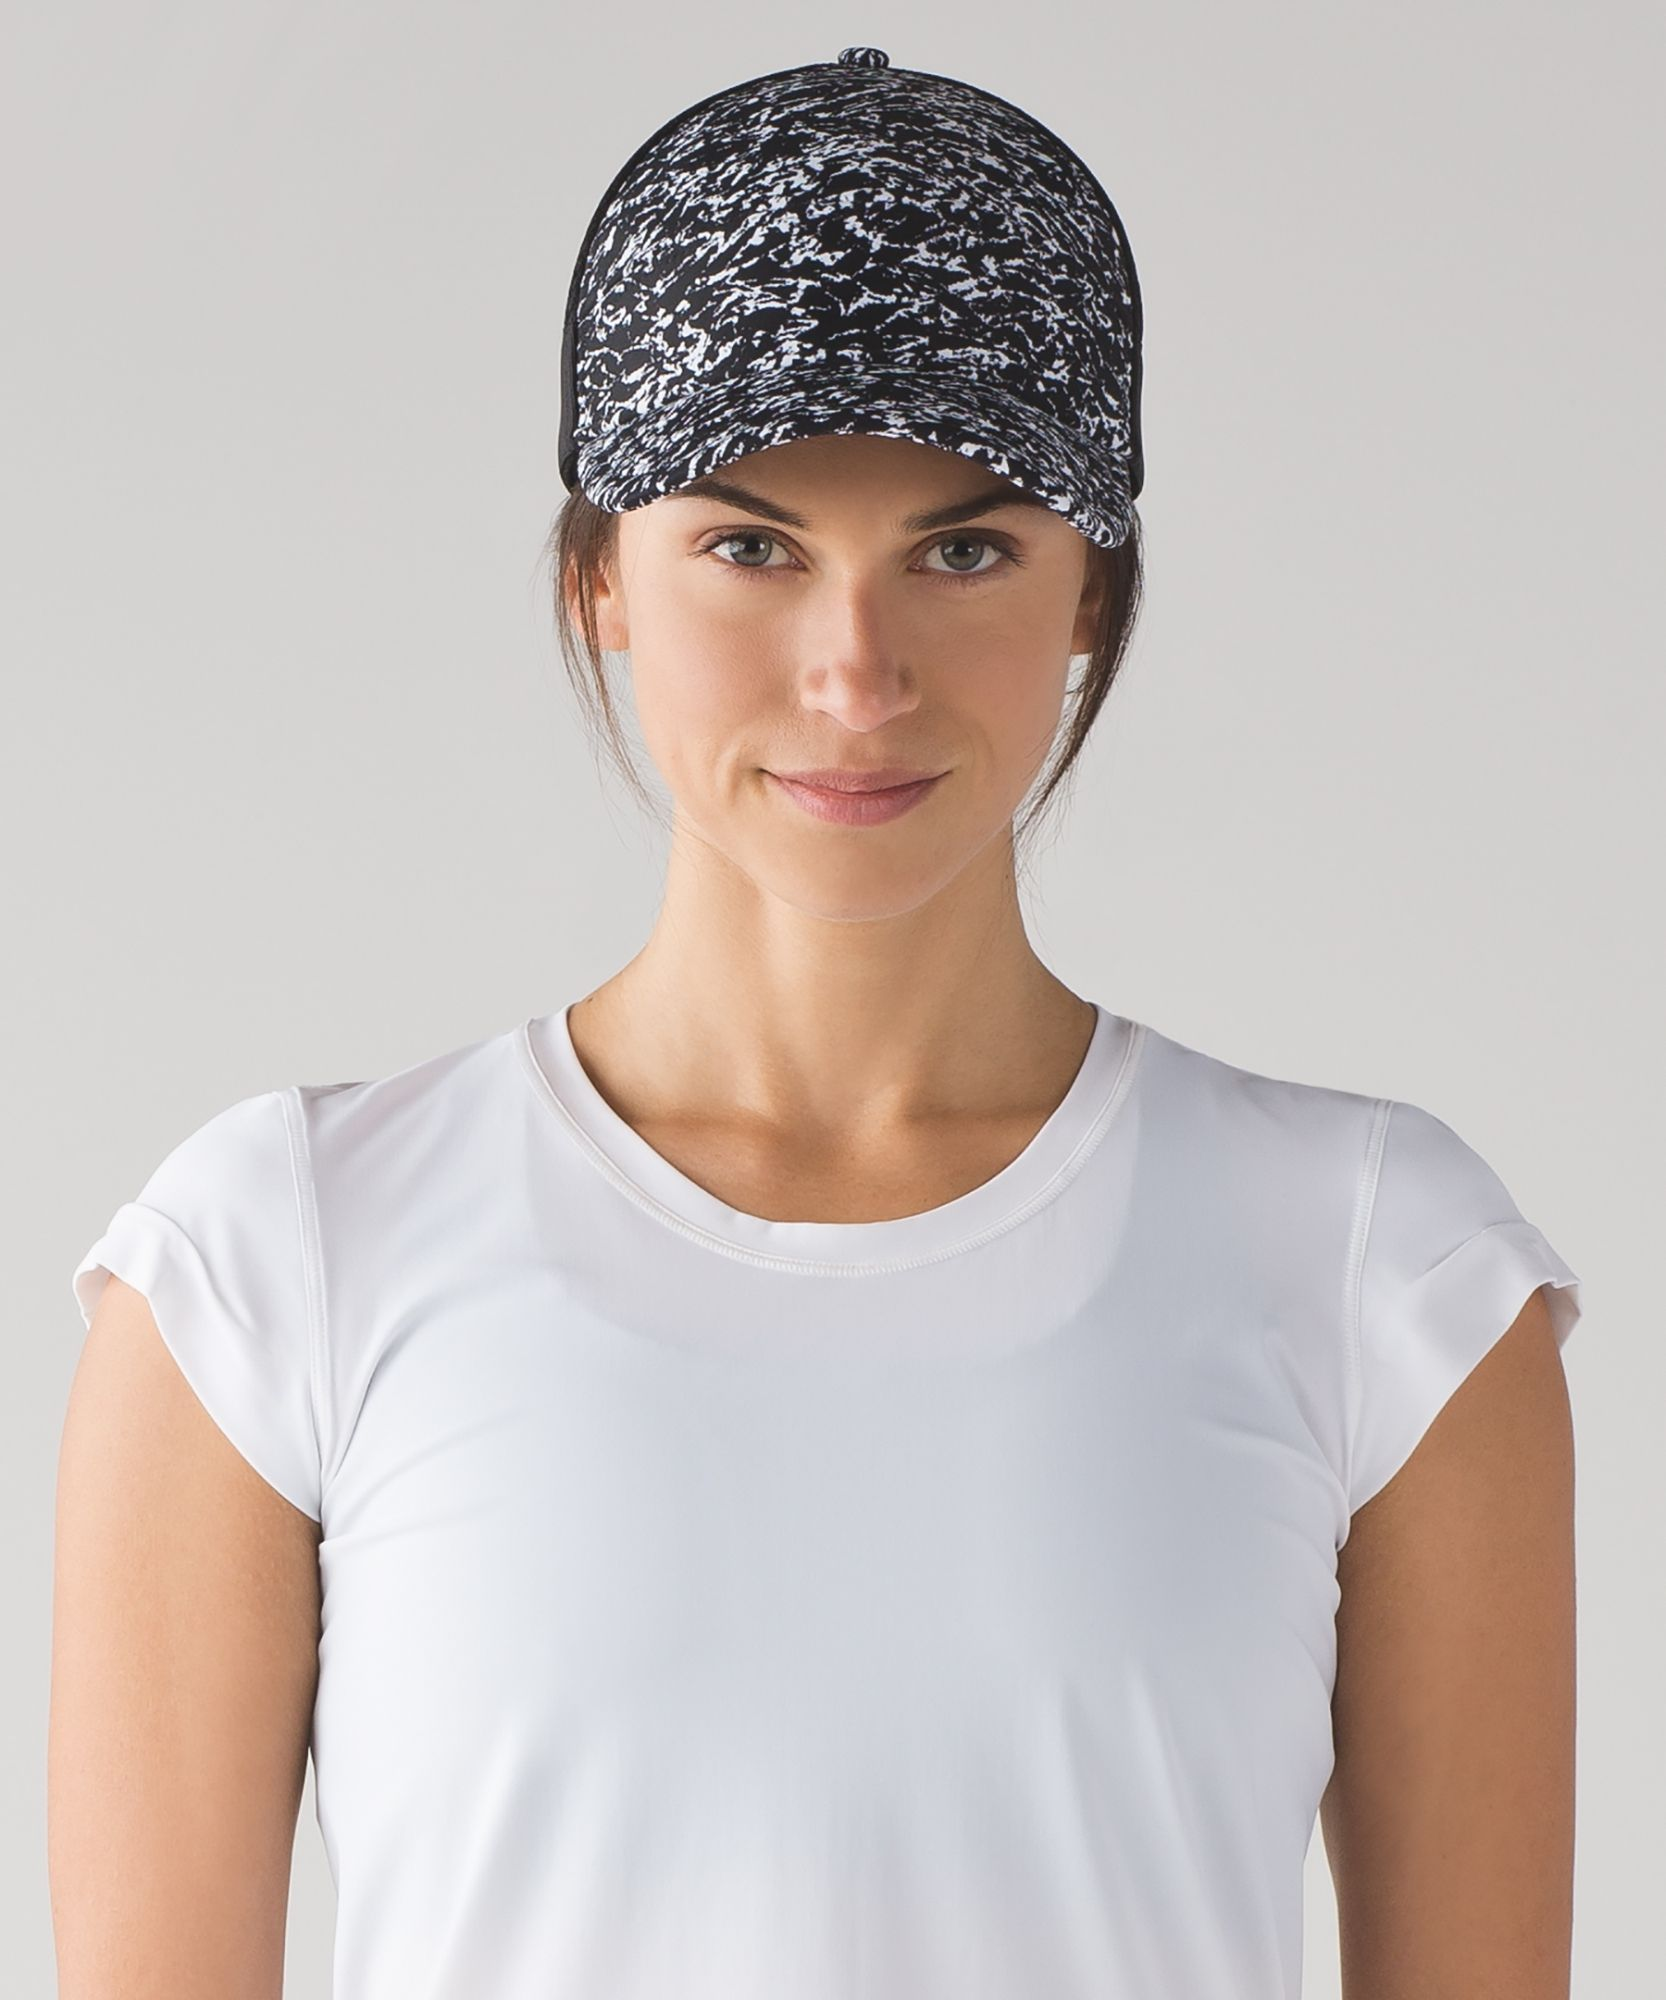 28242d9f Women's Sports Cap - (iced wave white black/black) - Dash And Splash ...